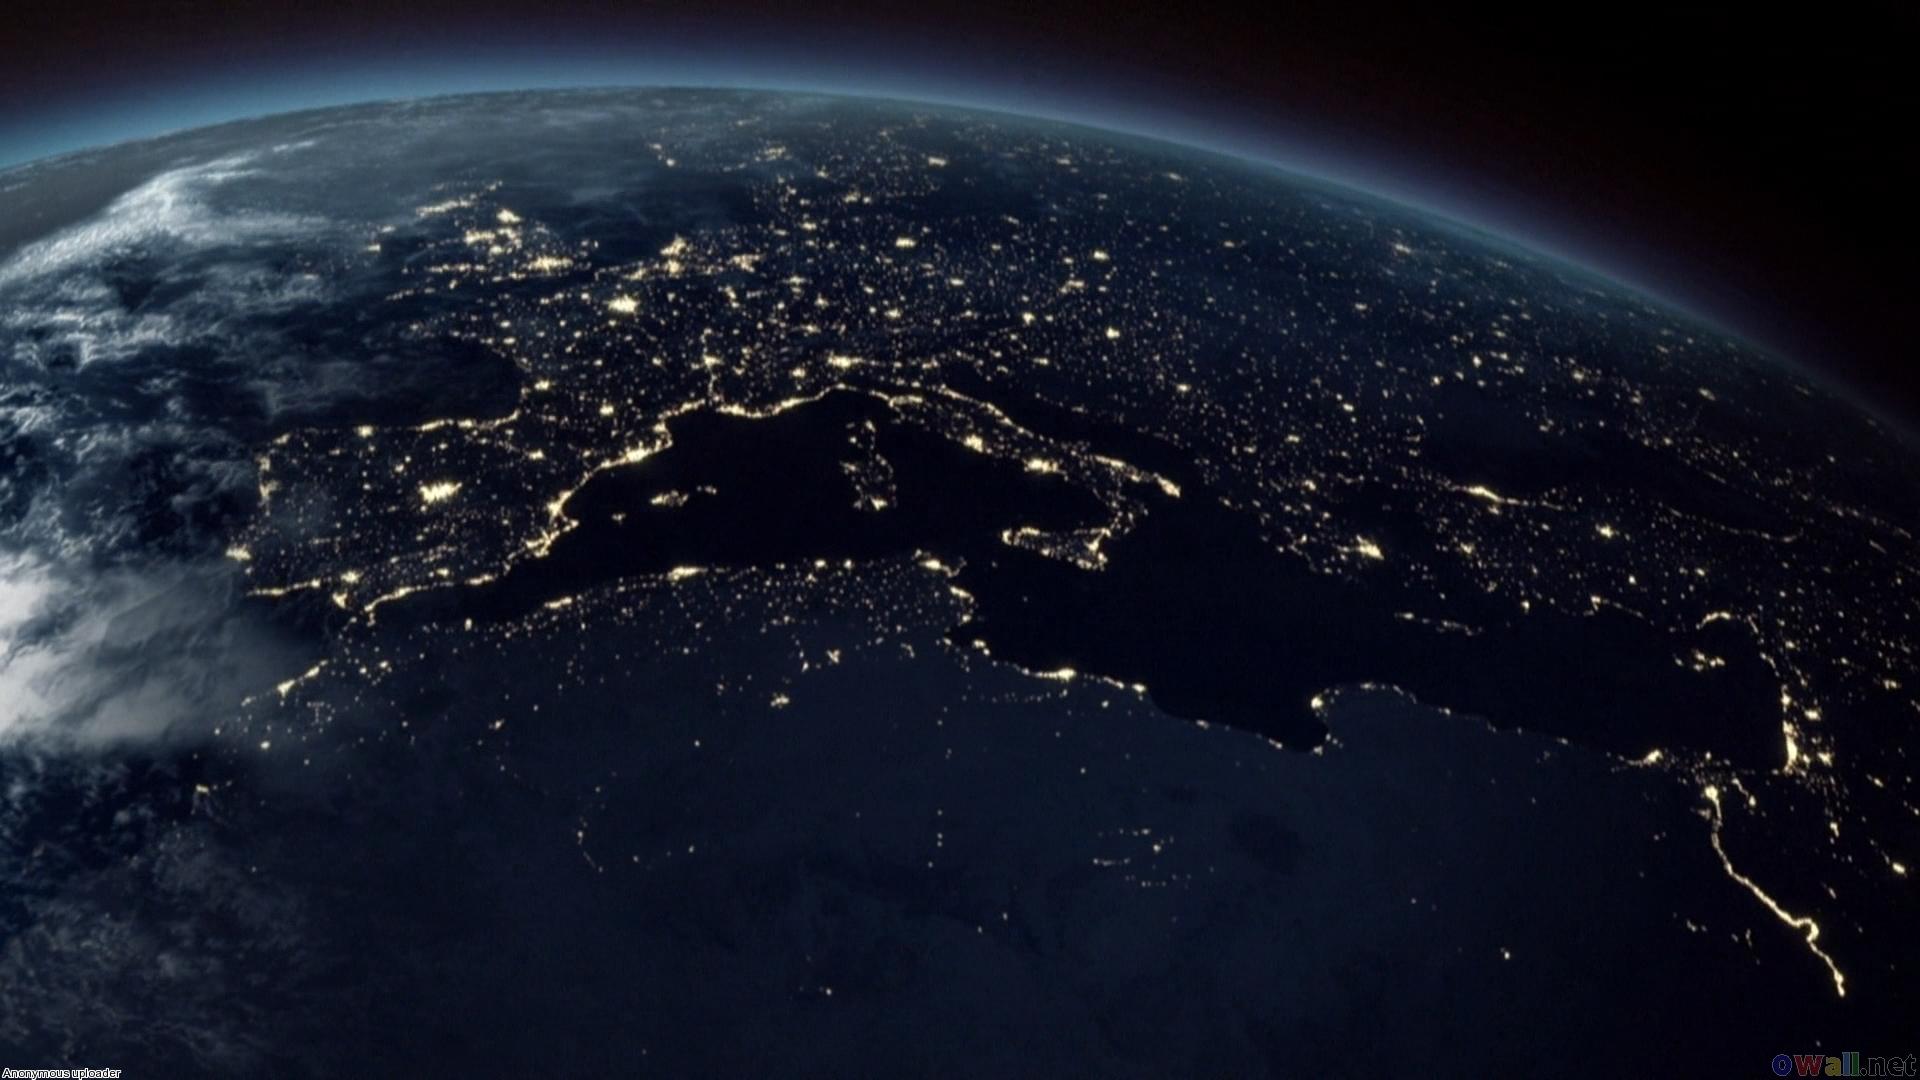 earth from space wallpaper wallpapersafari